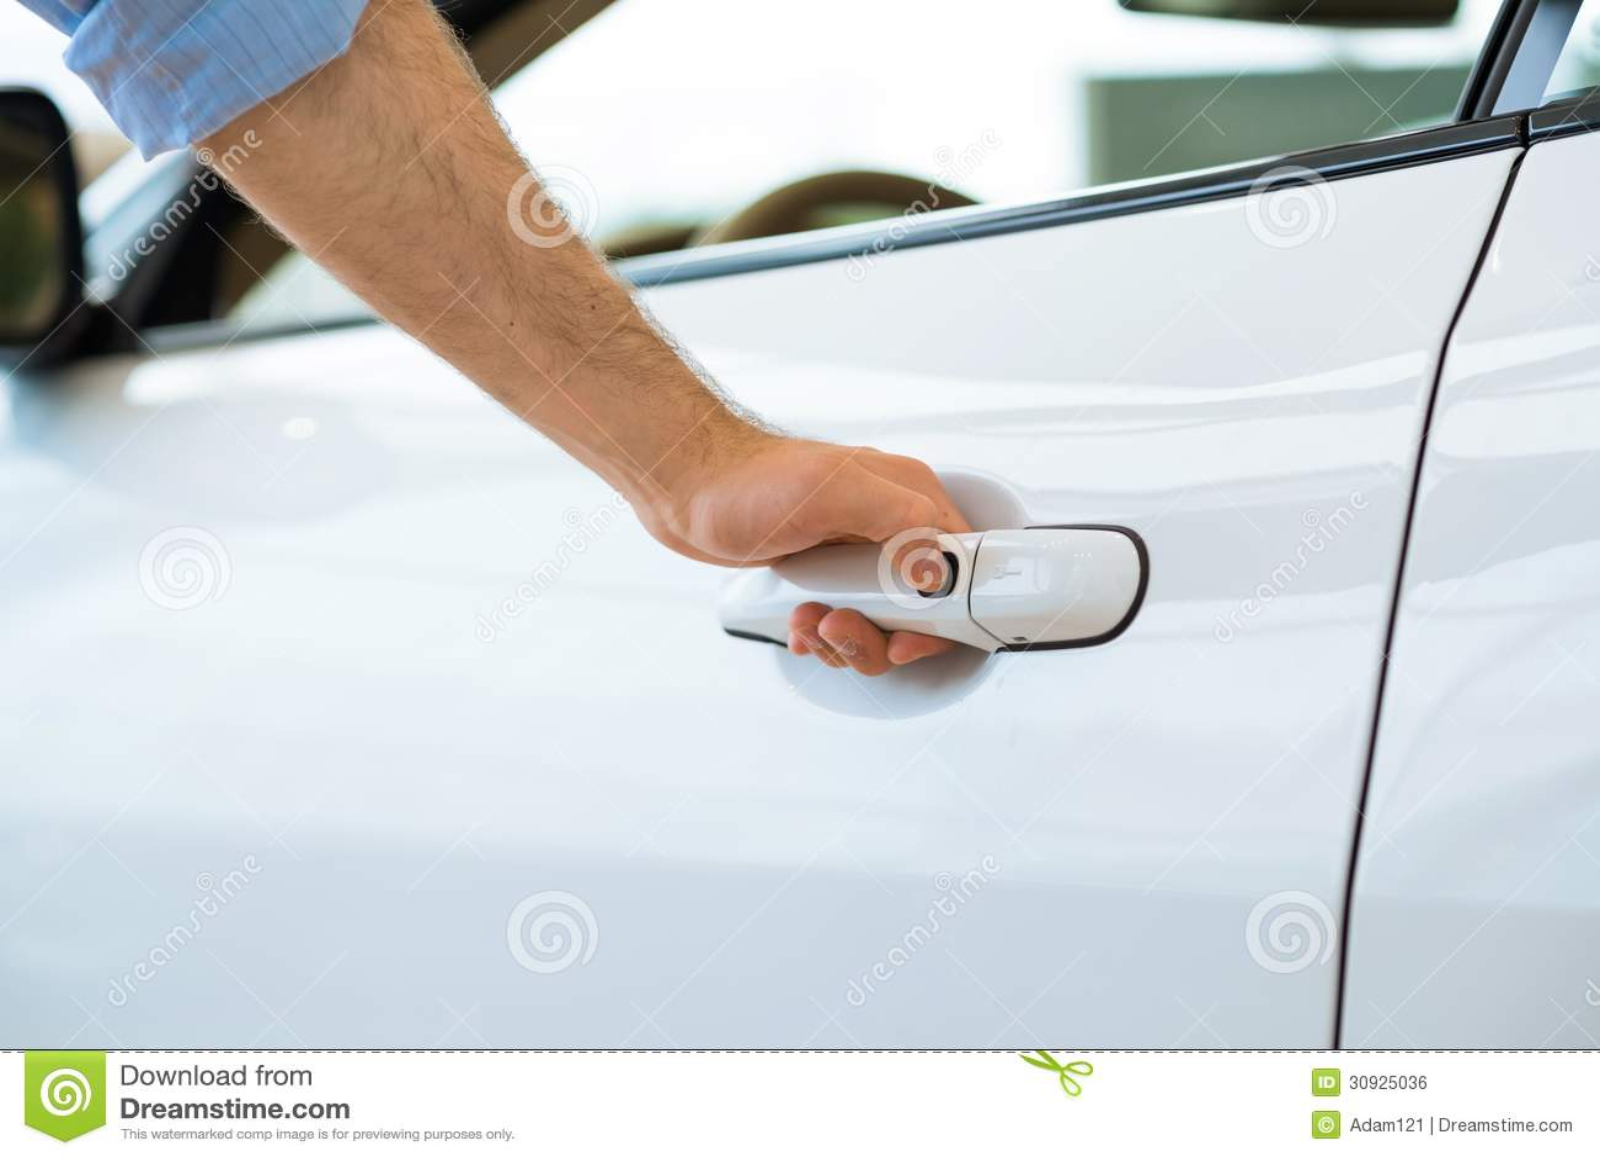 man close the car door stock photo 49576968. Black Bedroom Furniture Sets. Home Design Ideas